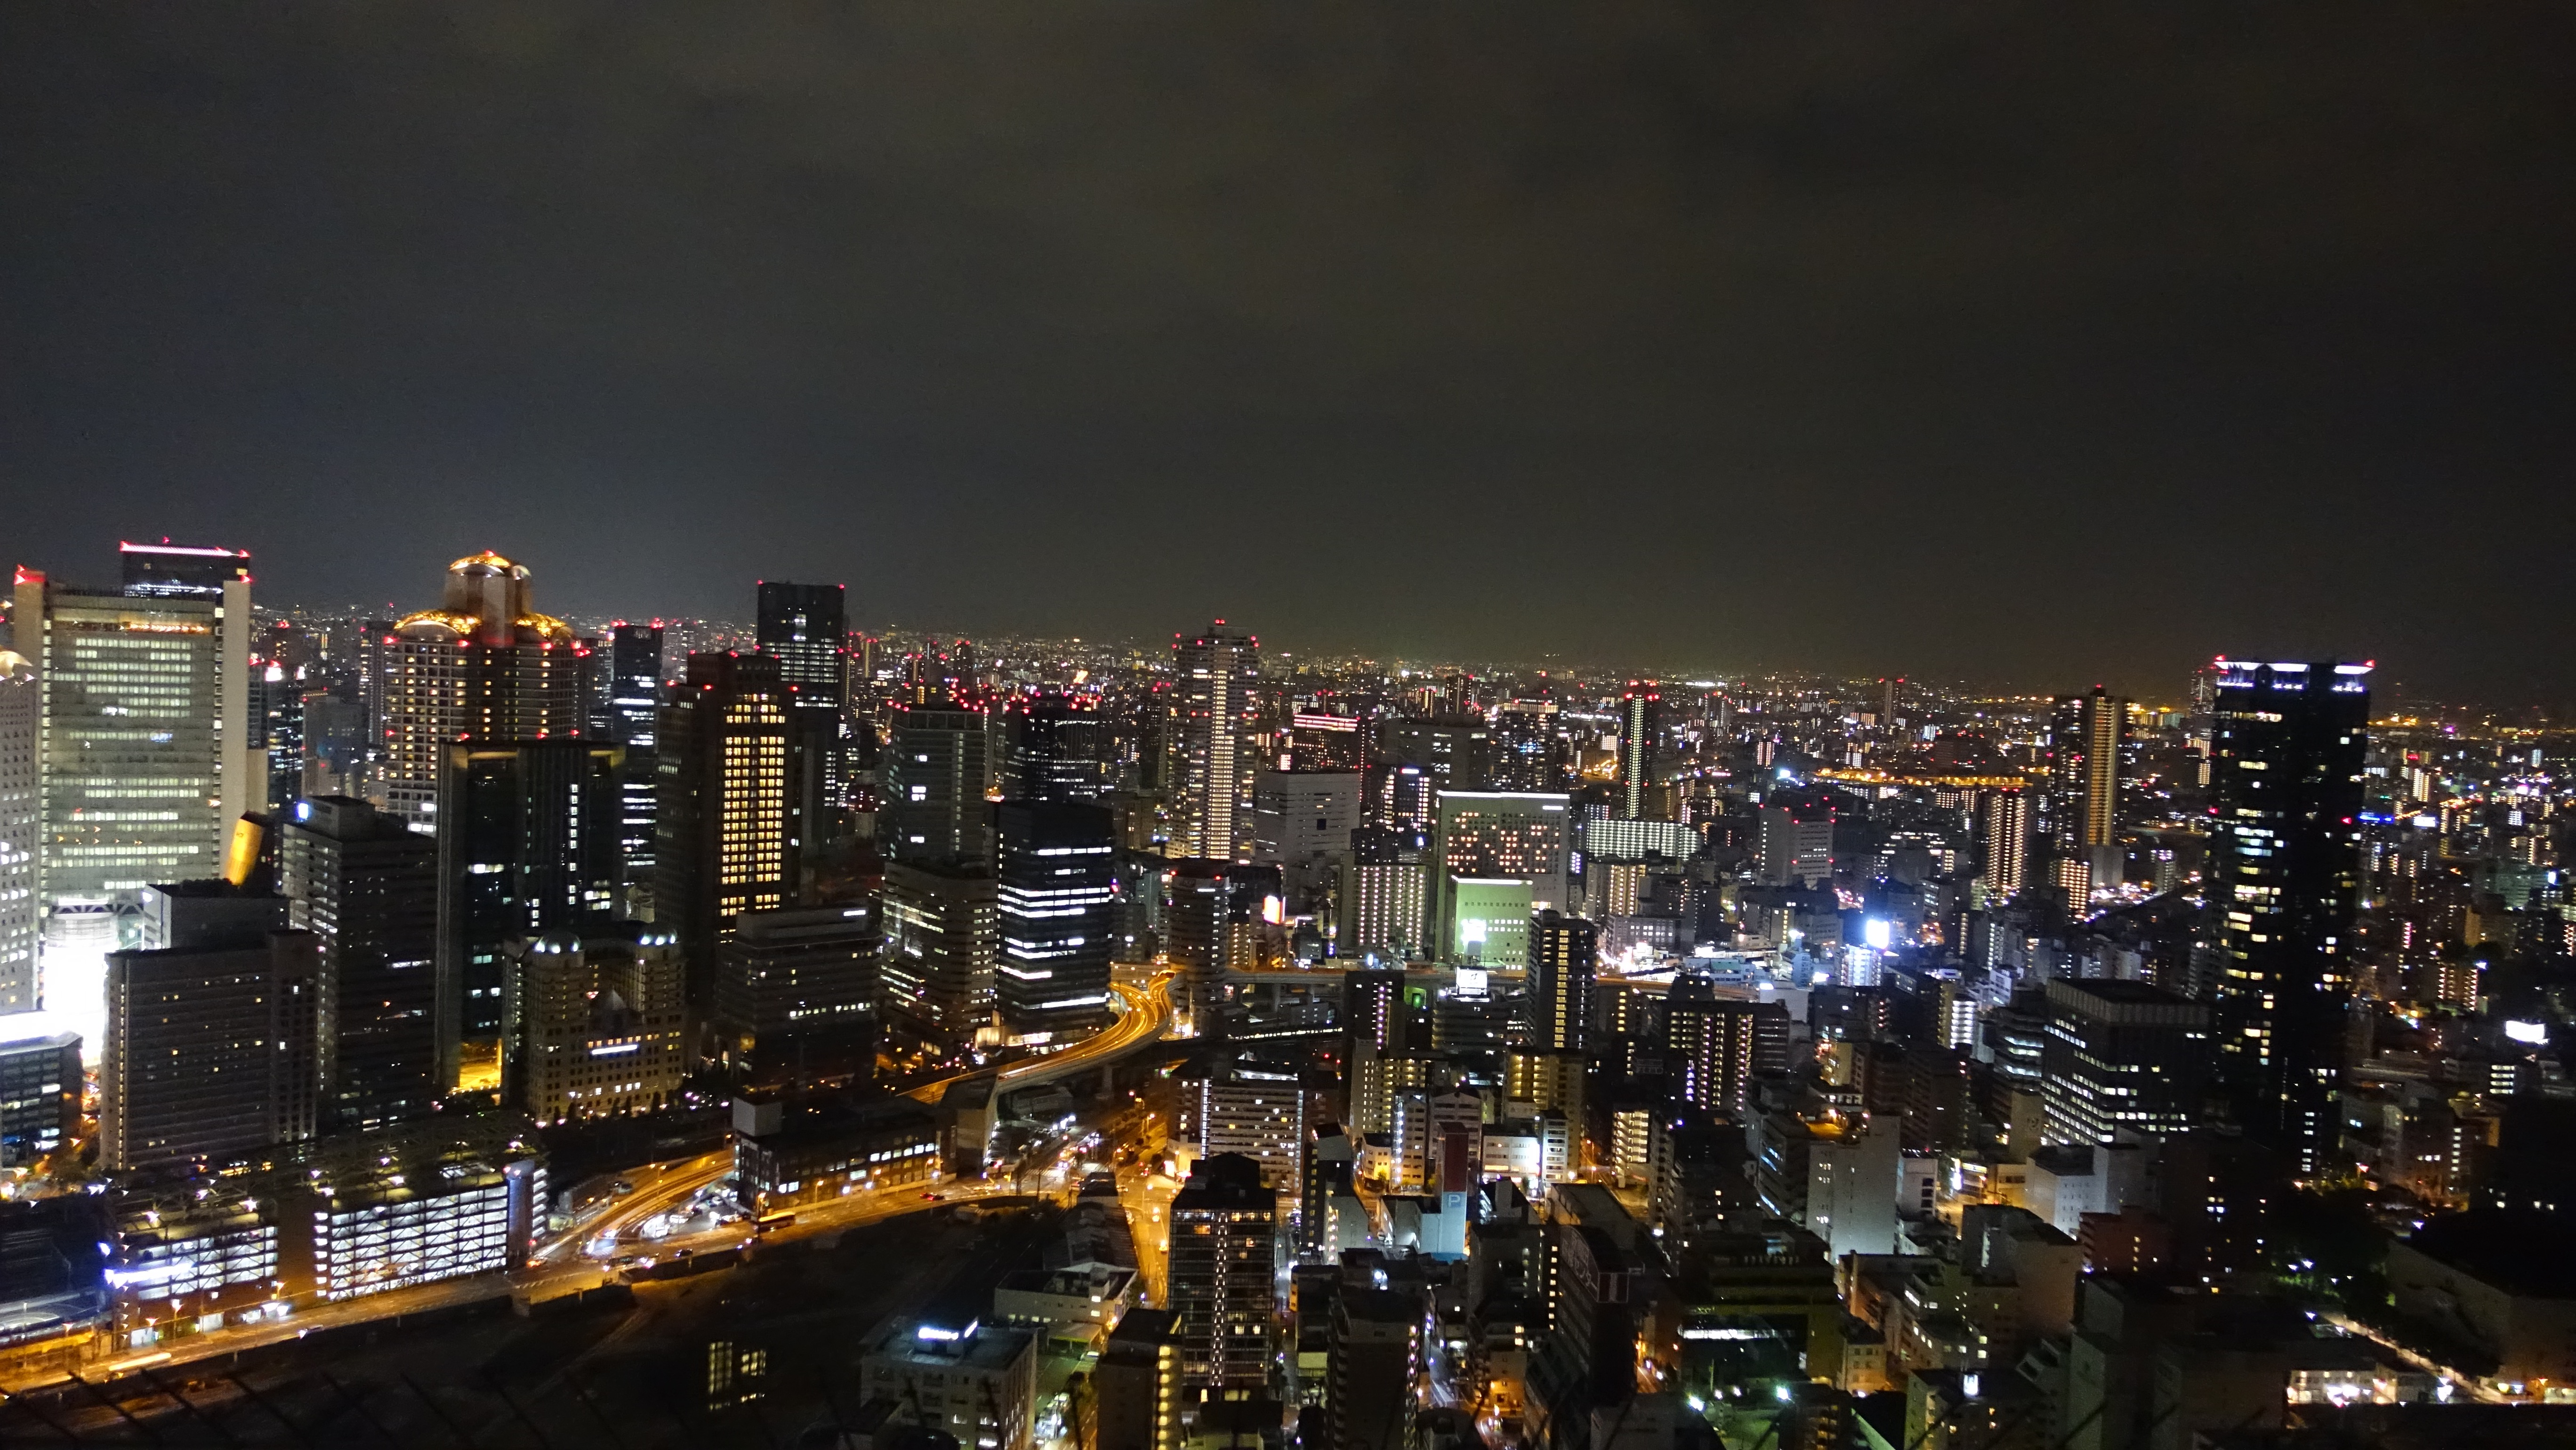 Osaka David-Minh TRA - Japon qui es-tu